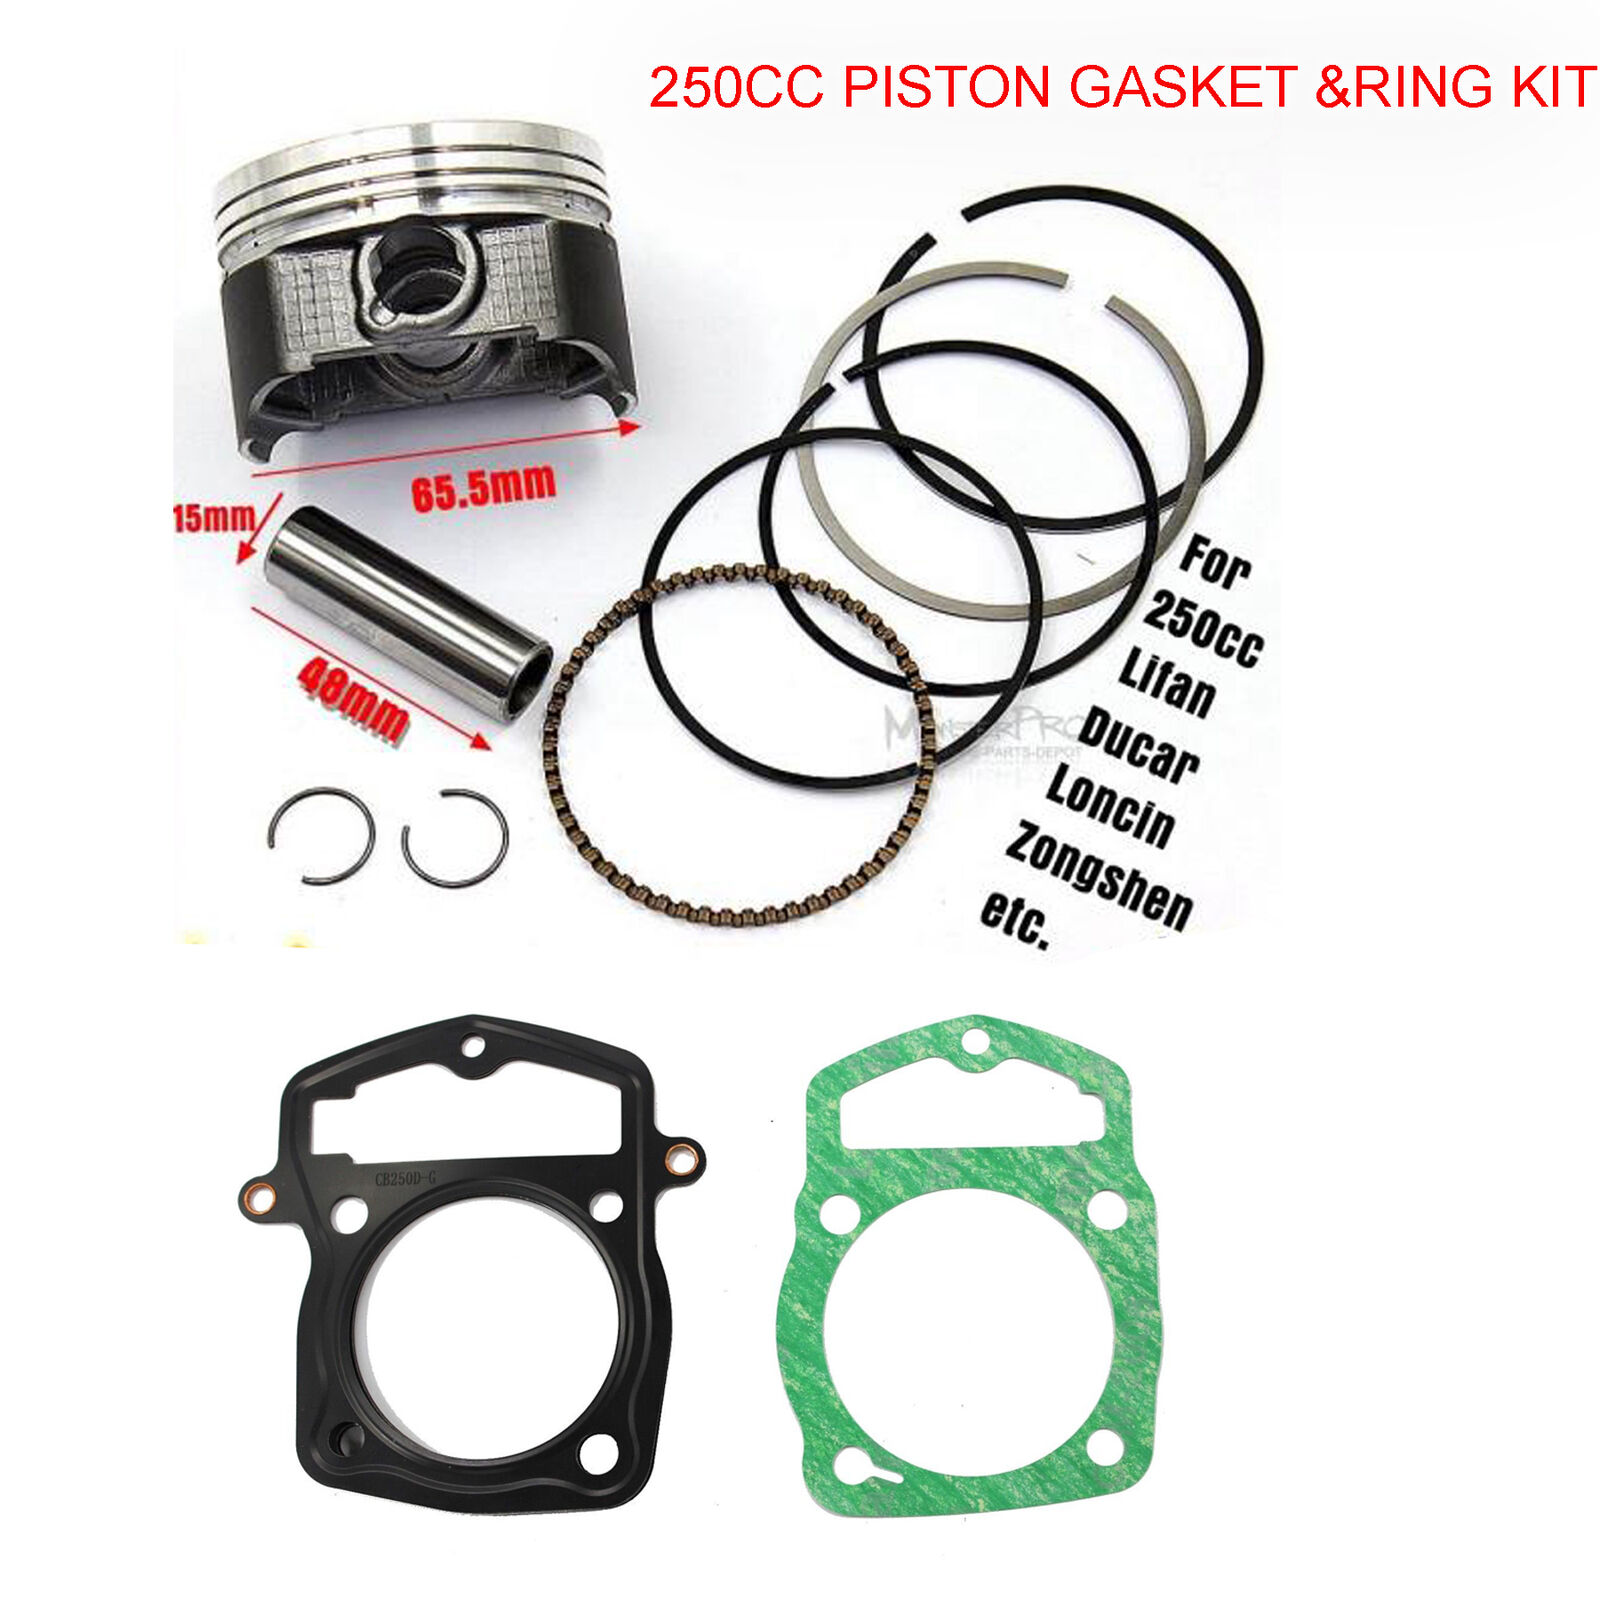 250CC PISTON KIT SET RINGS 65 5mm For Atomik Thumpstar DIRT